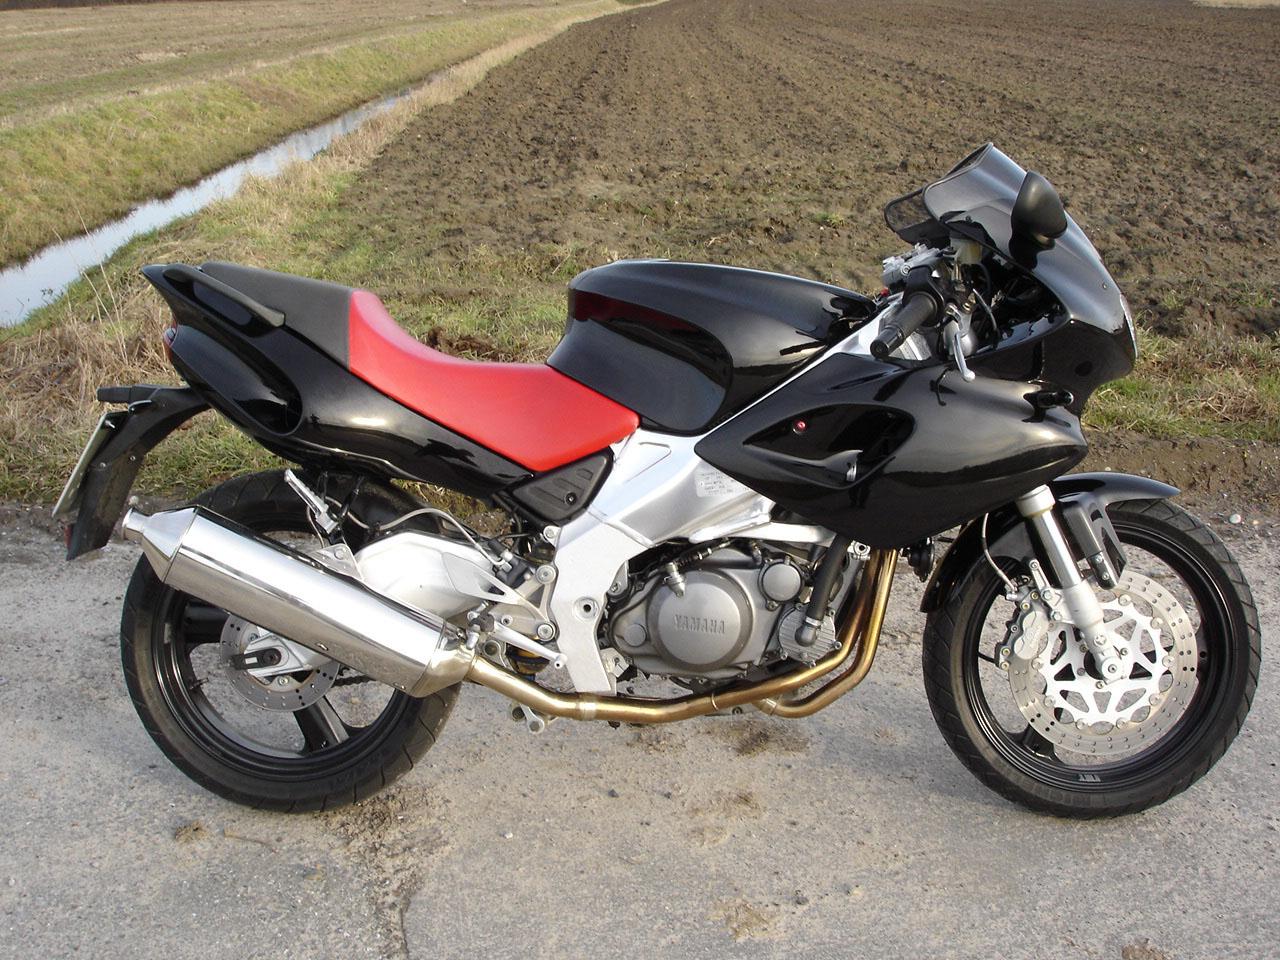 Yamaha Sz R Price